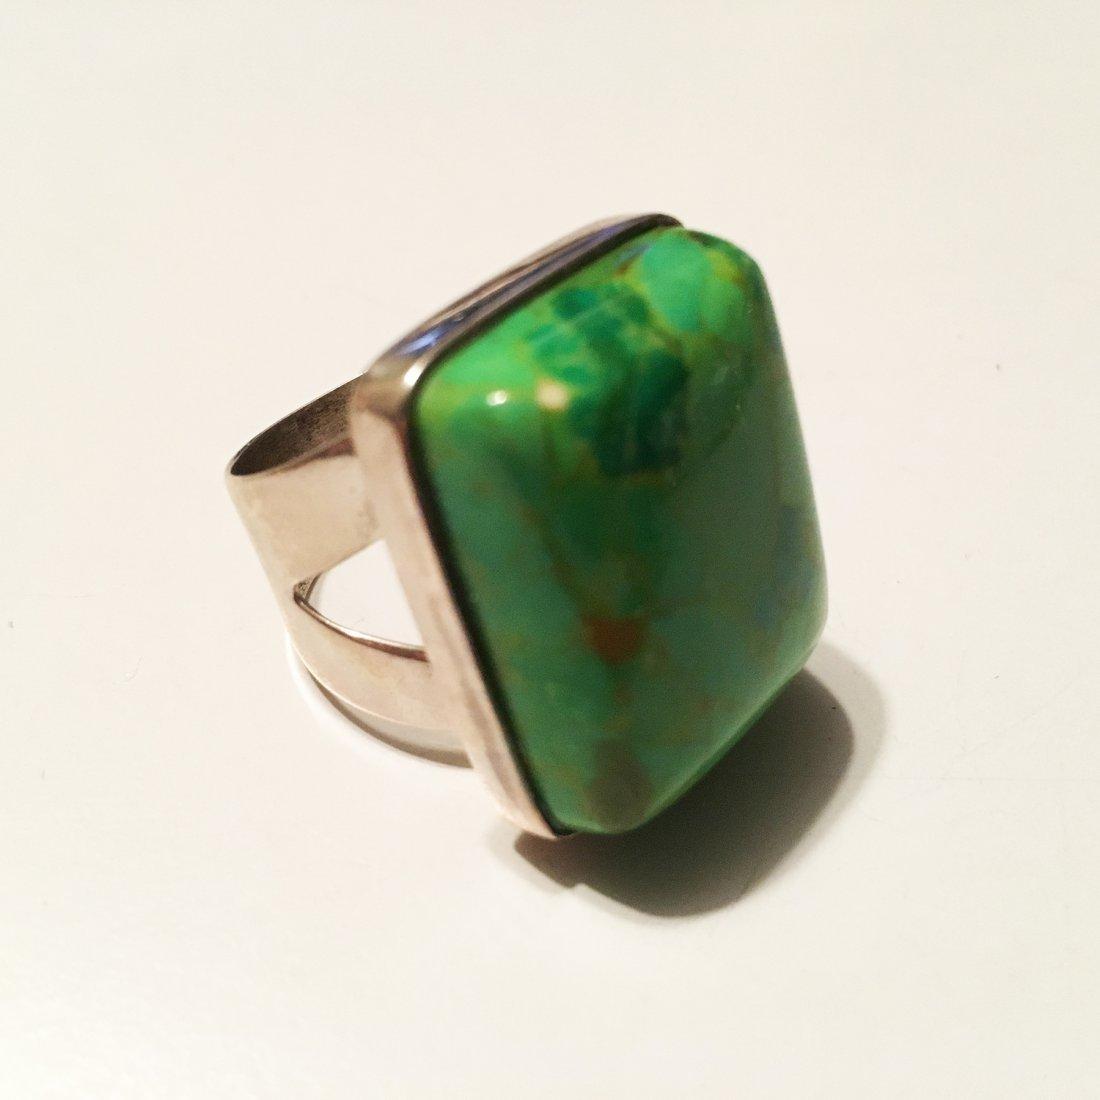 Impressive Sterling Silver Rings - 2